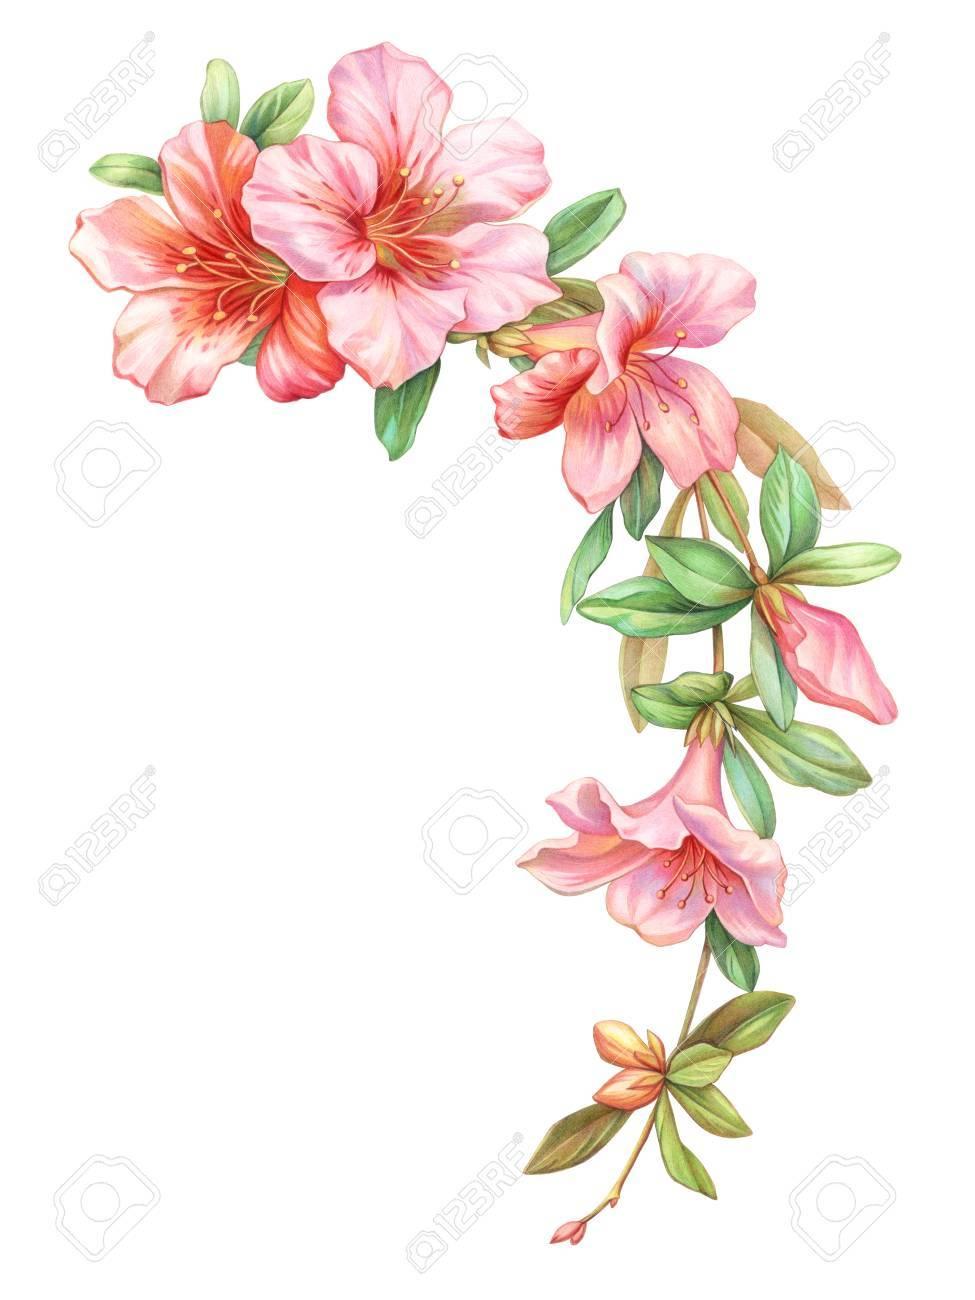 Pink White Rose Vintage Azalea Flowers Garland Wreath Isolated ...